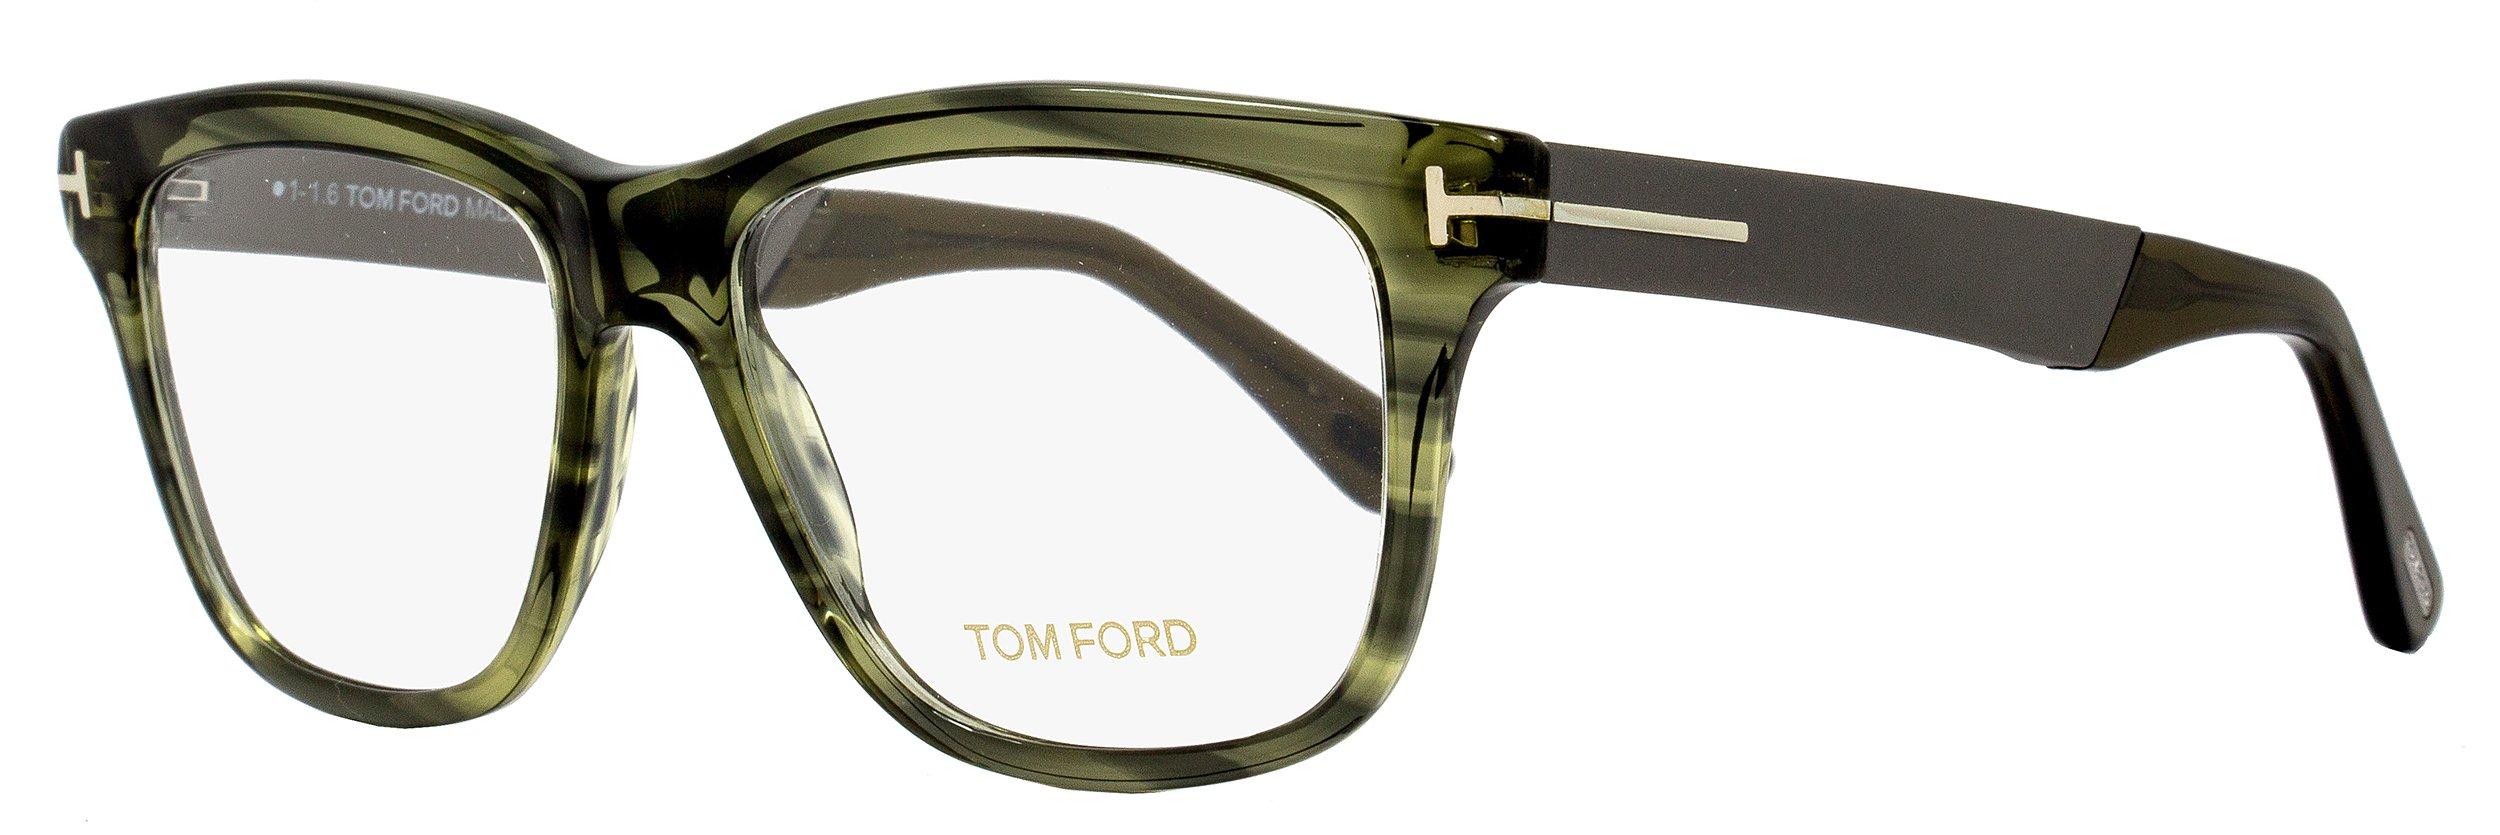 Tom Ford Eyeglasses TF 5372 Eyeglasses 098 Striped Green 54mm by Tom Ford